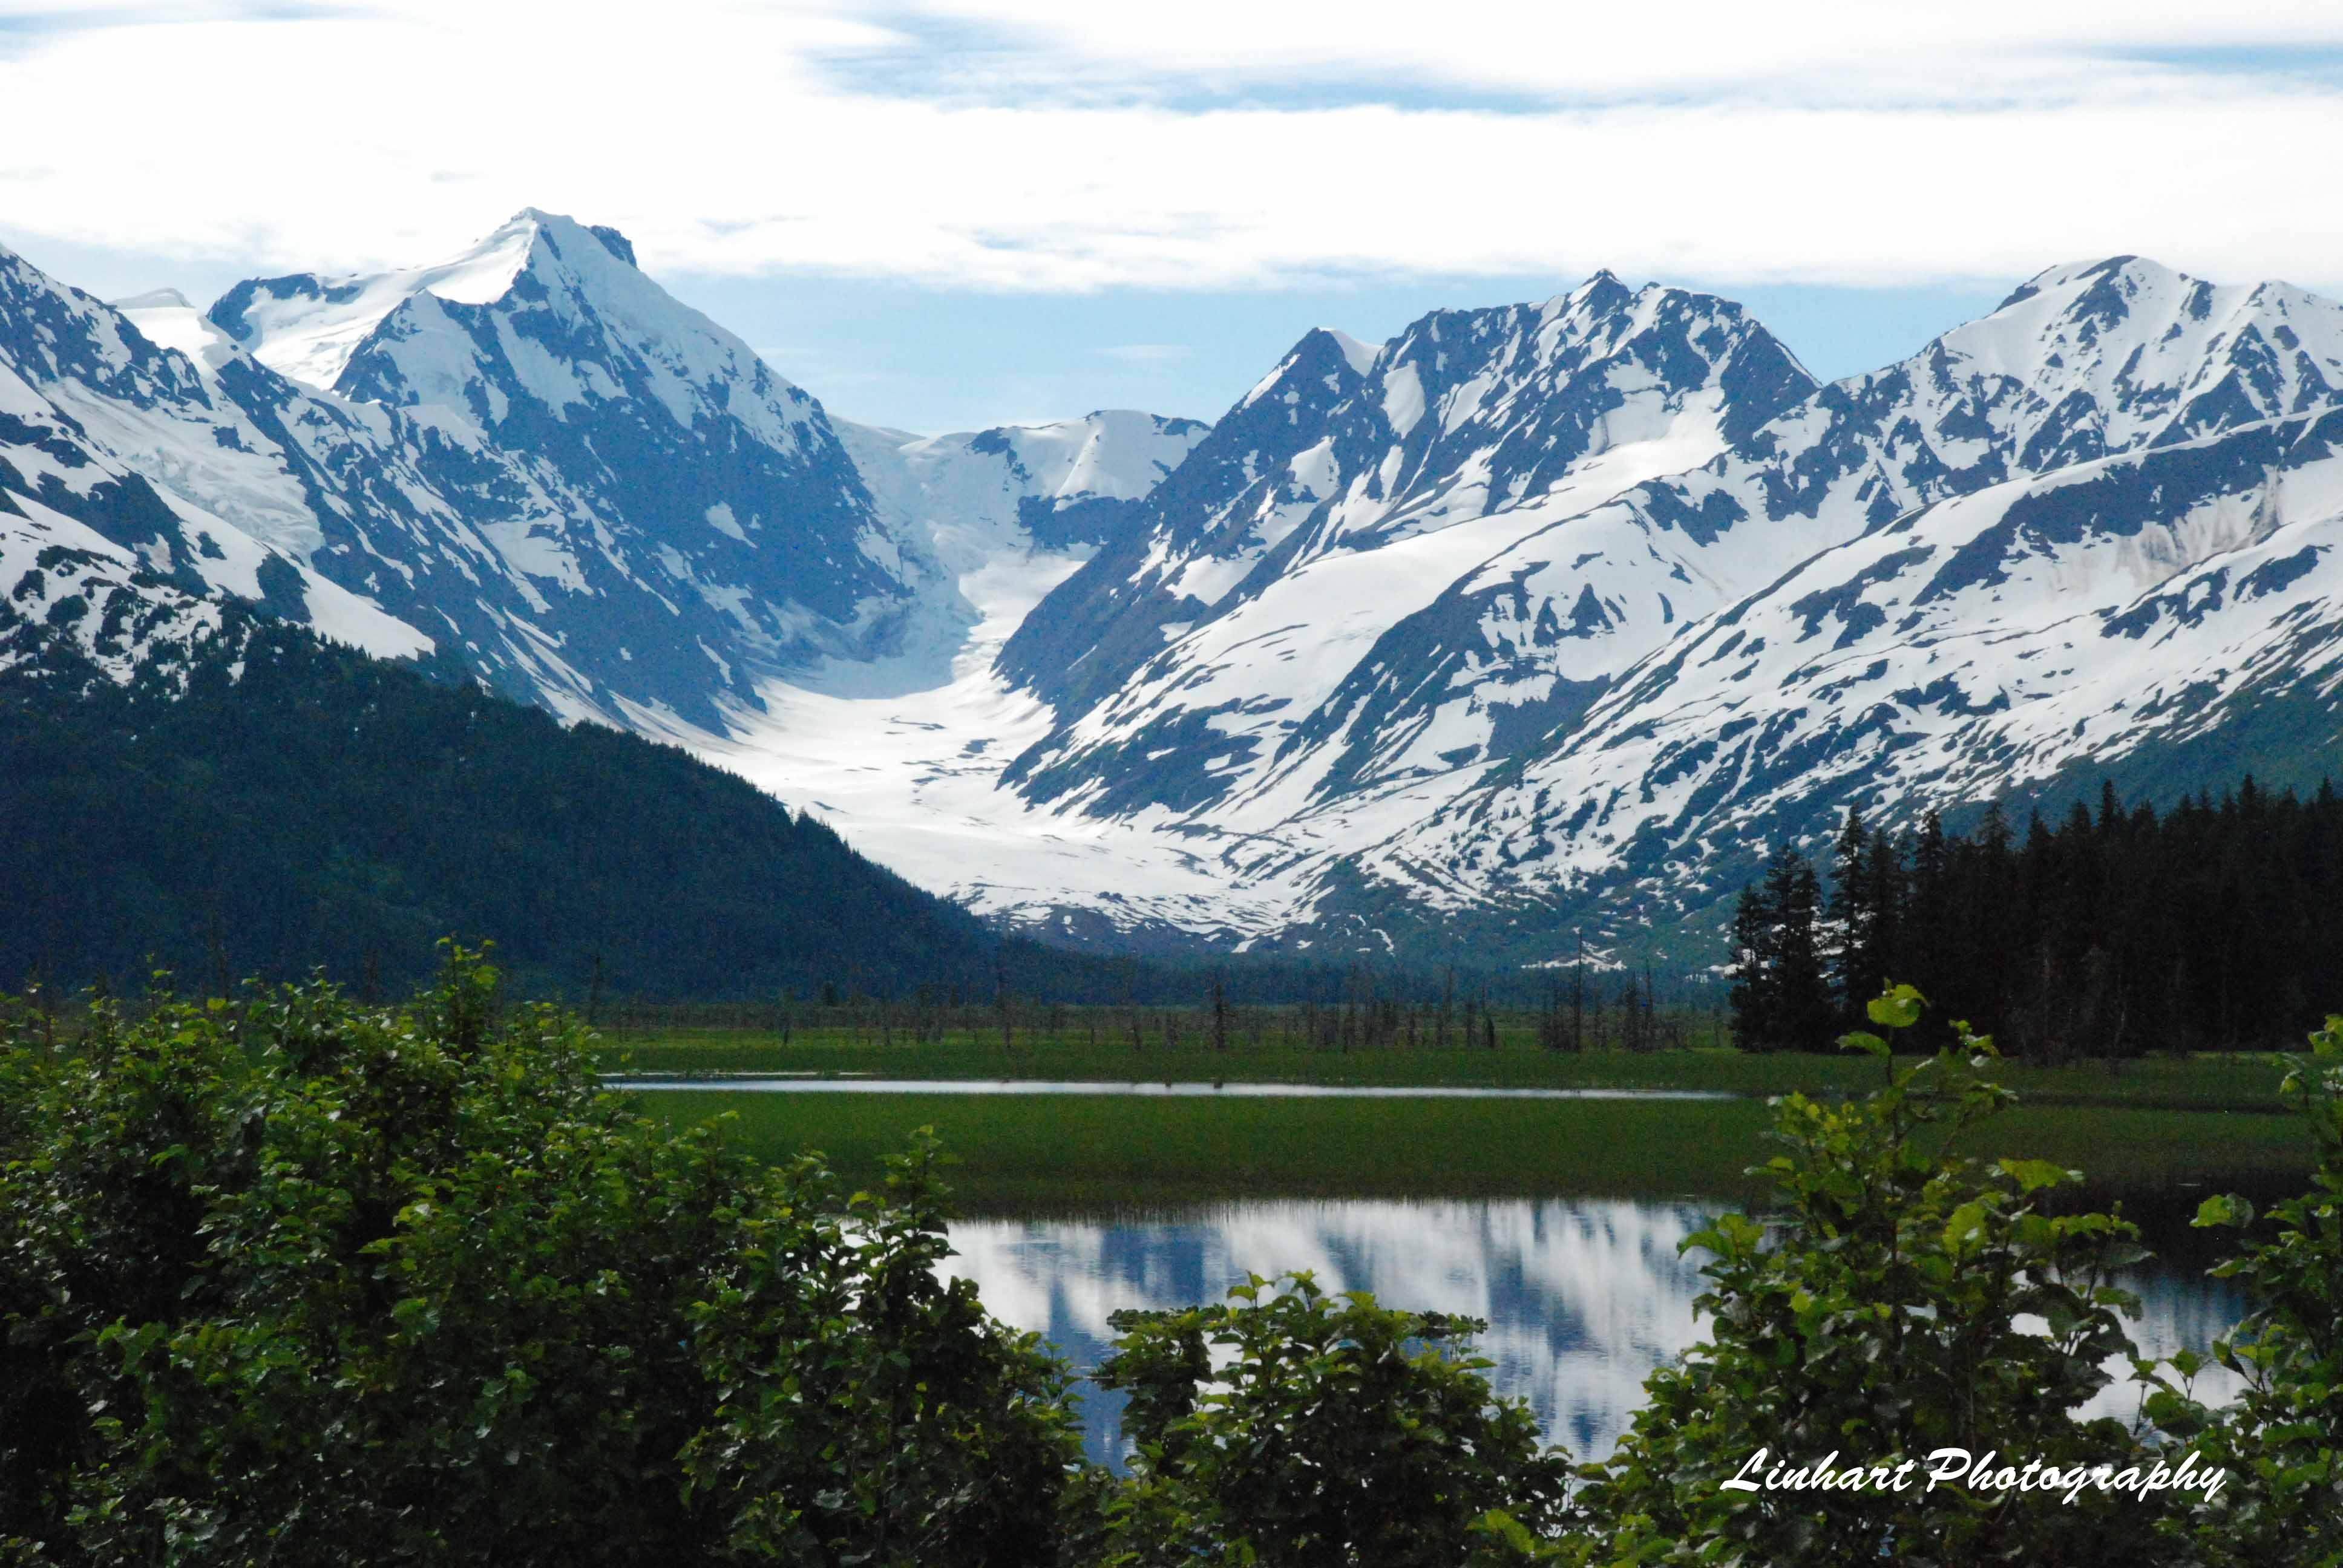 mountains linhart photography